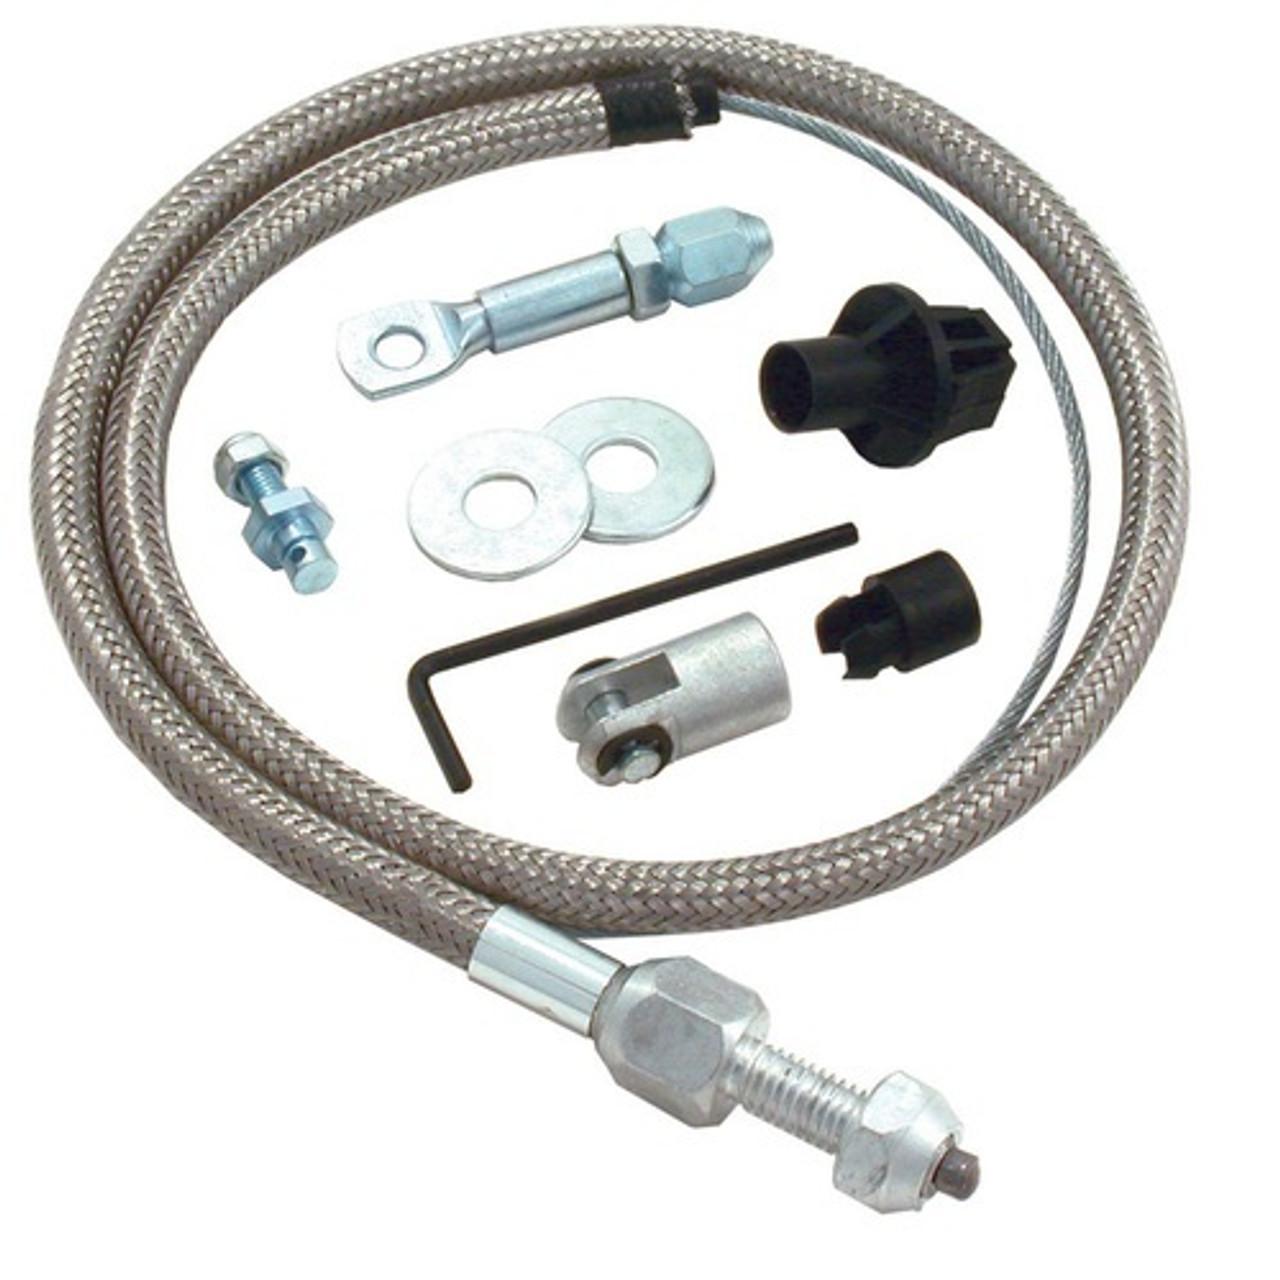 Throttle Cable Parts